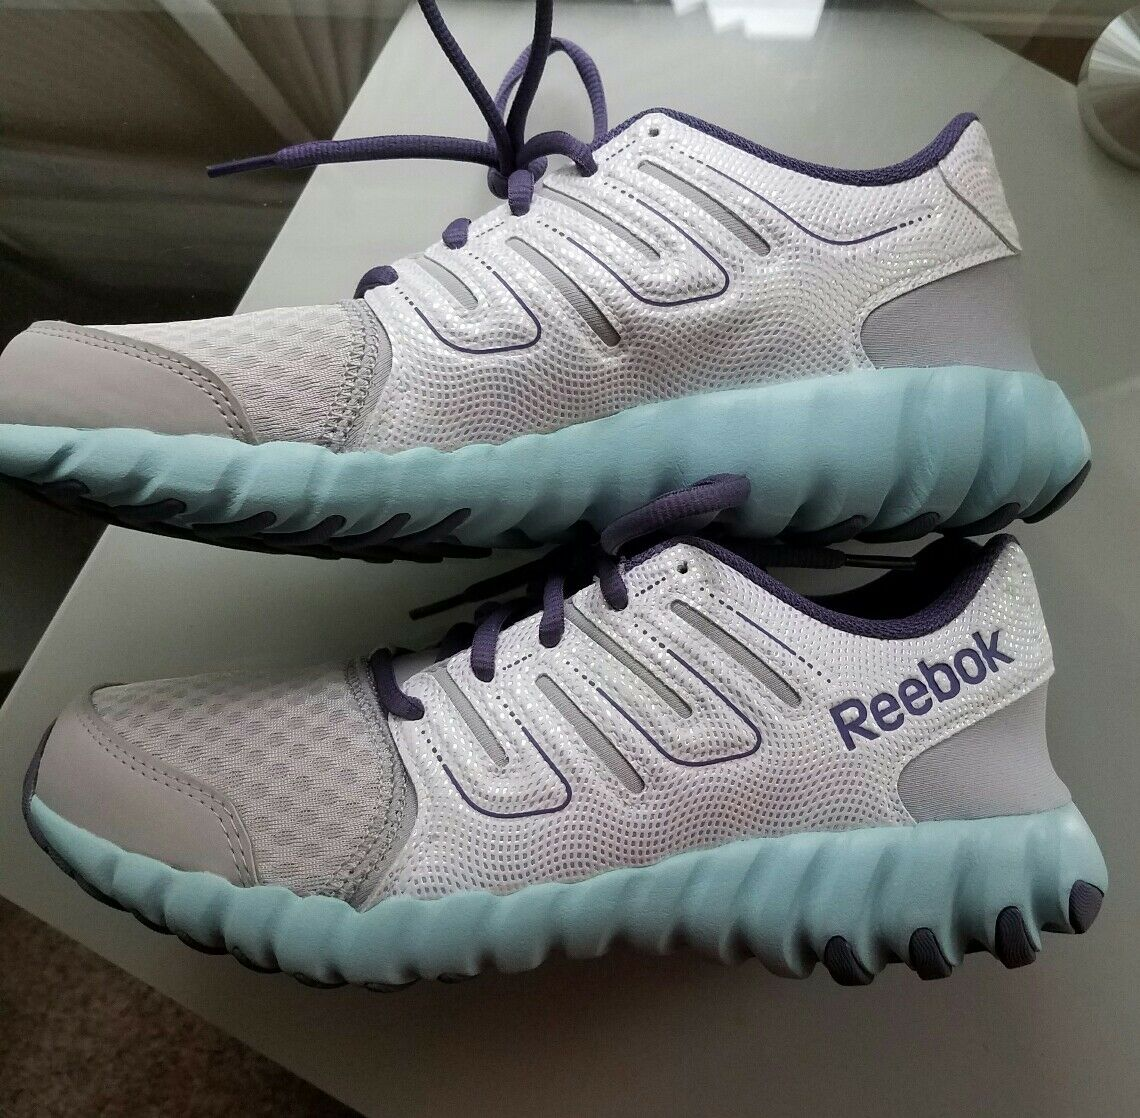 REEBOK 7.5 running shoes women's size 7.5 REEBOK youth size 6..new..never worn 1ce952